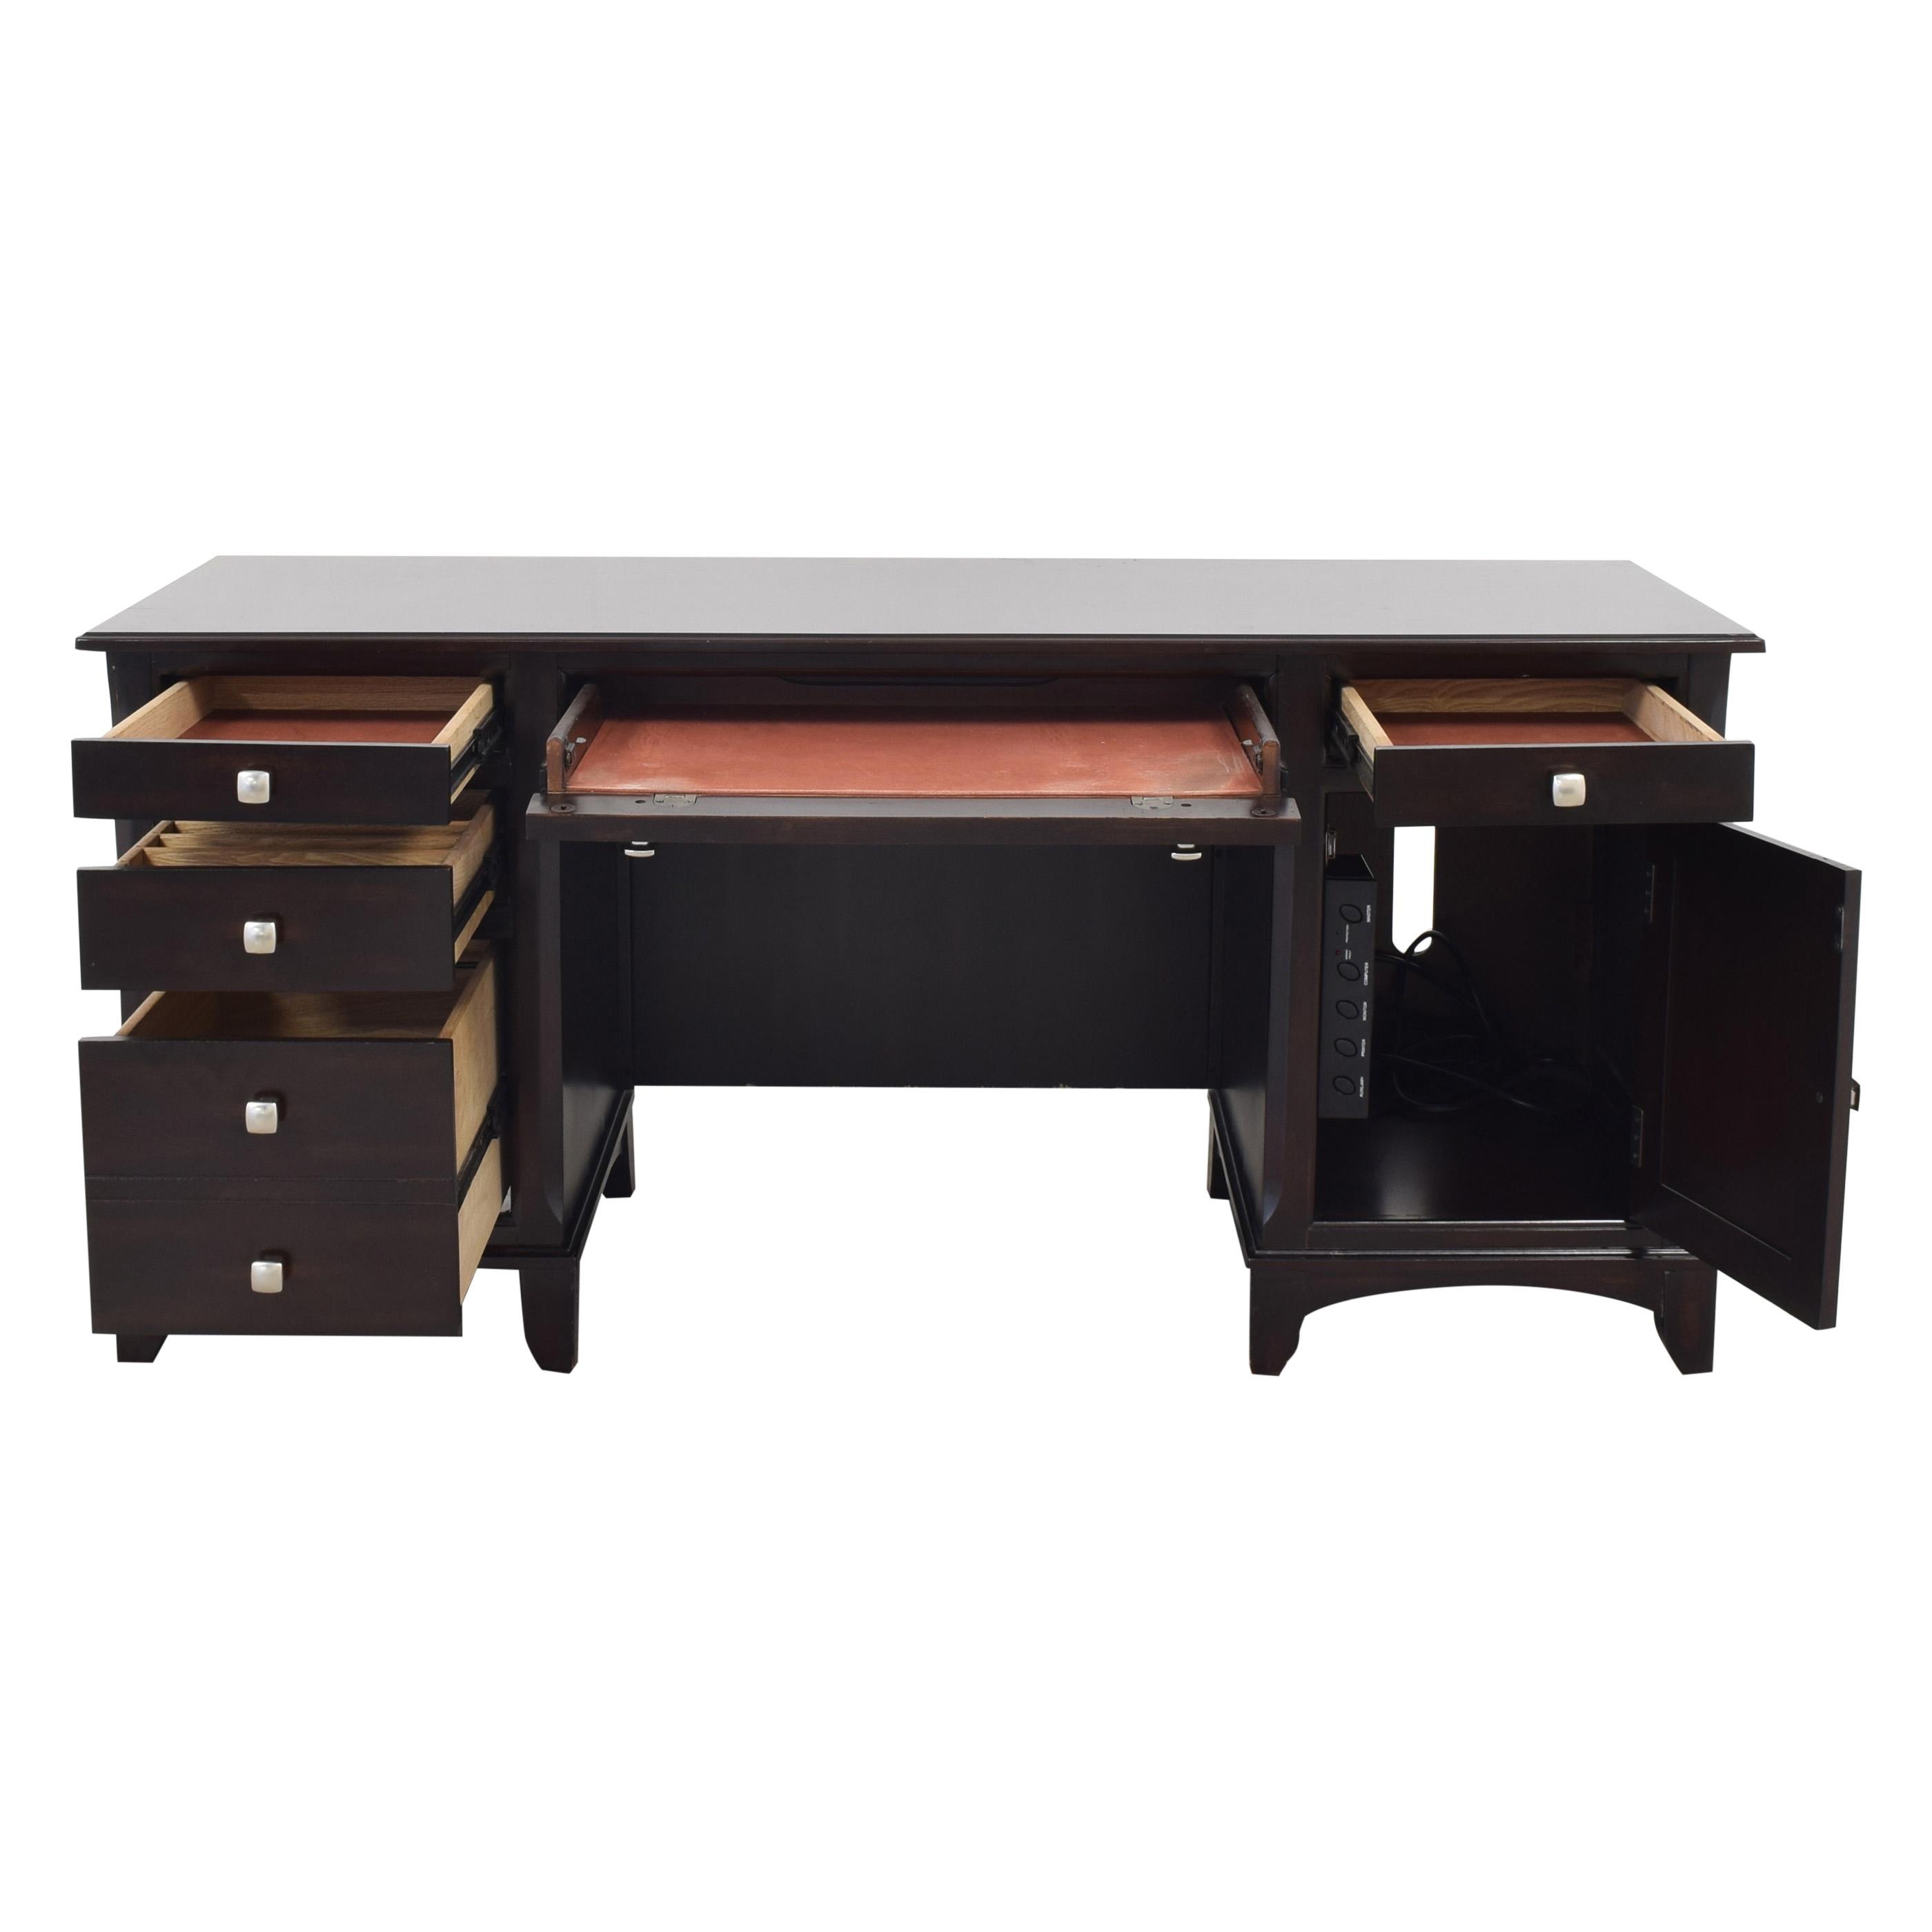 Coaster Fine Furniture Coaster Fine Furniture Garson Office Desk nyc